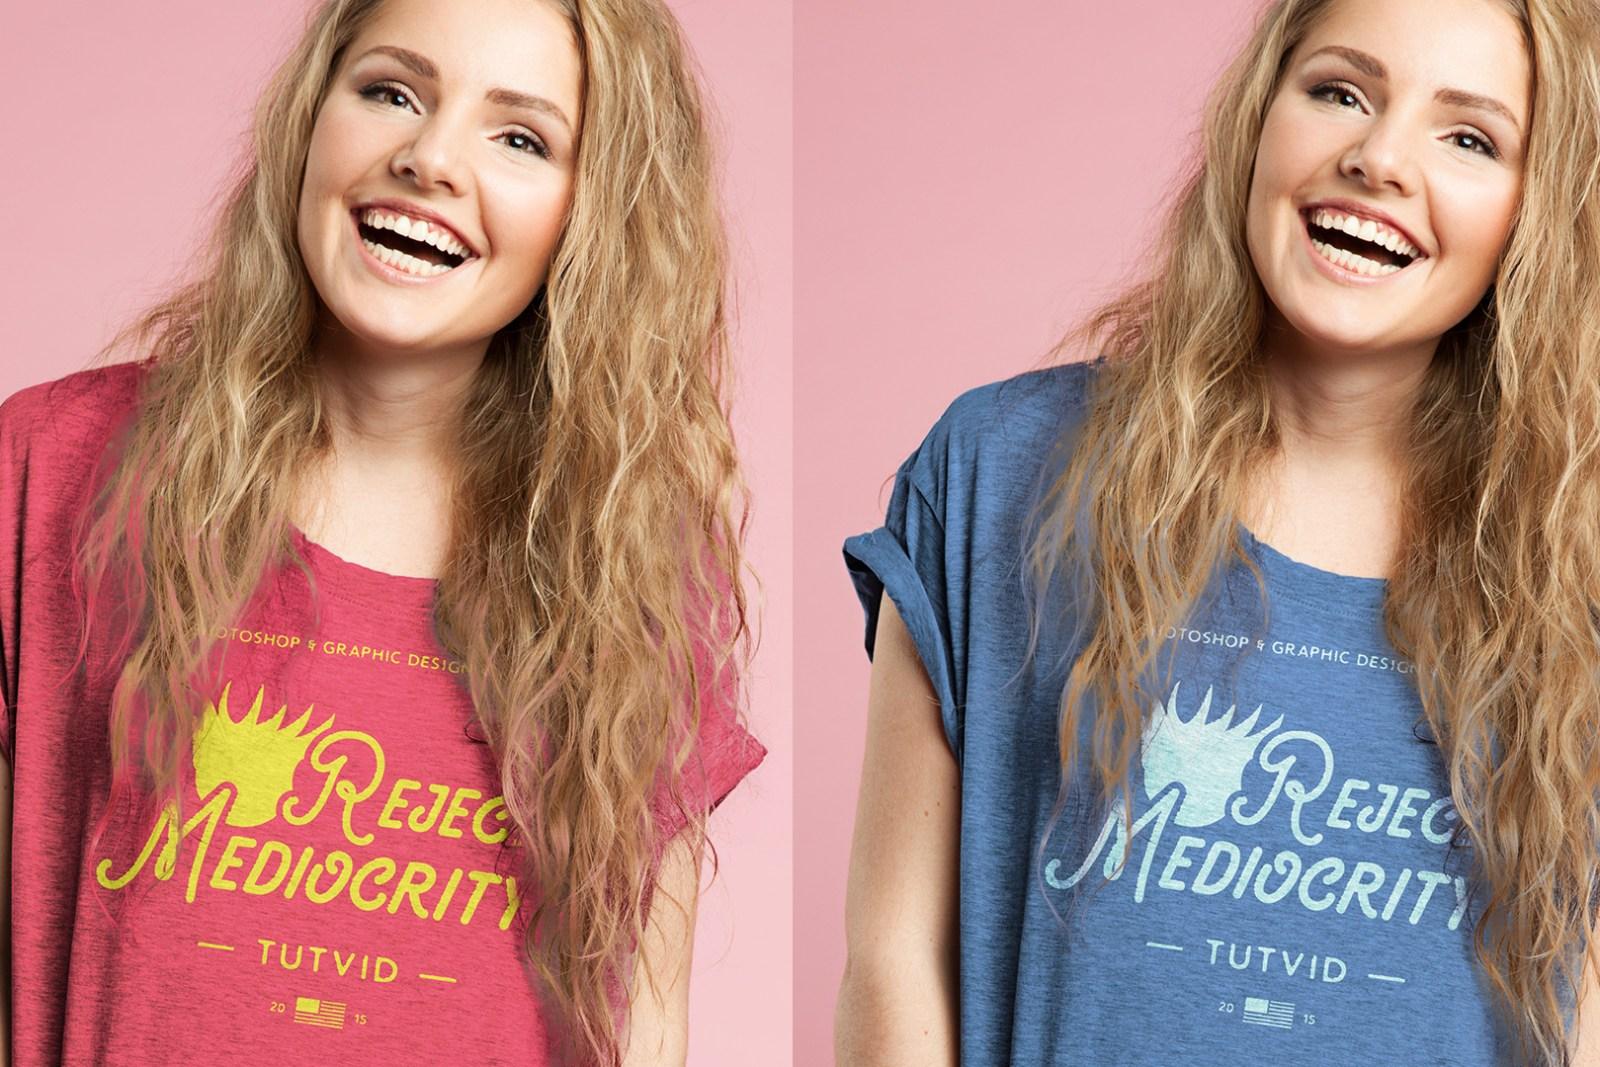 create-graphic-tshirt-mock-up-design-photoshop-tutorial